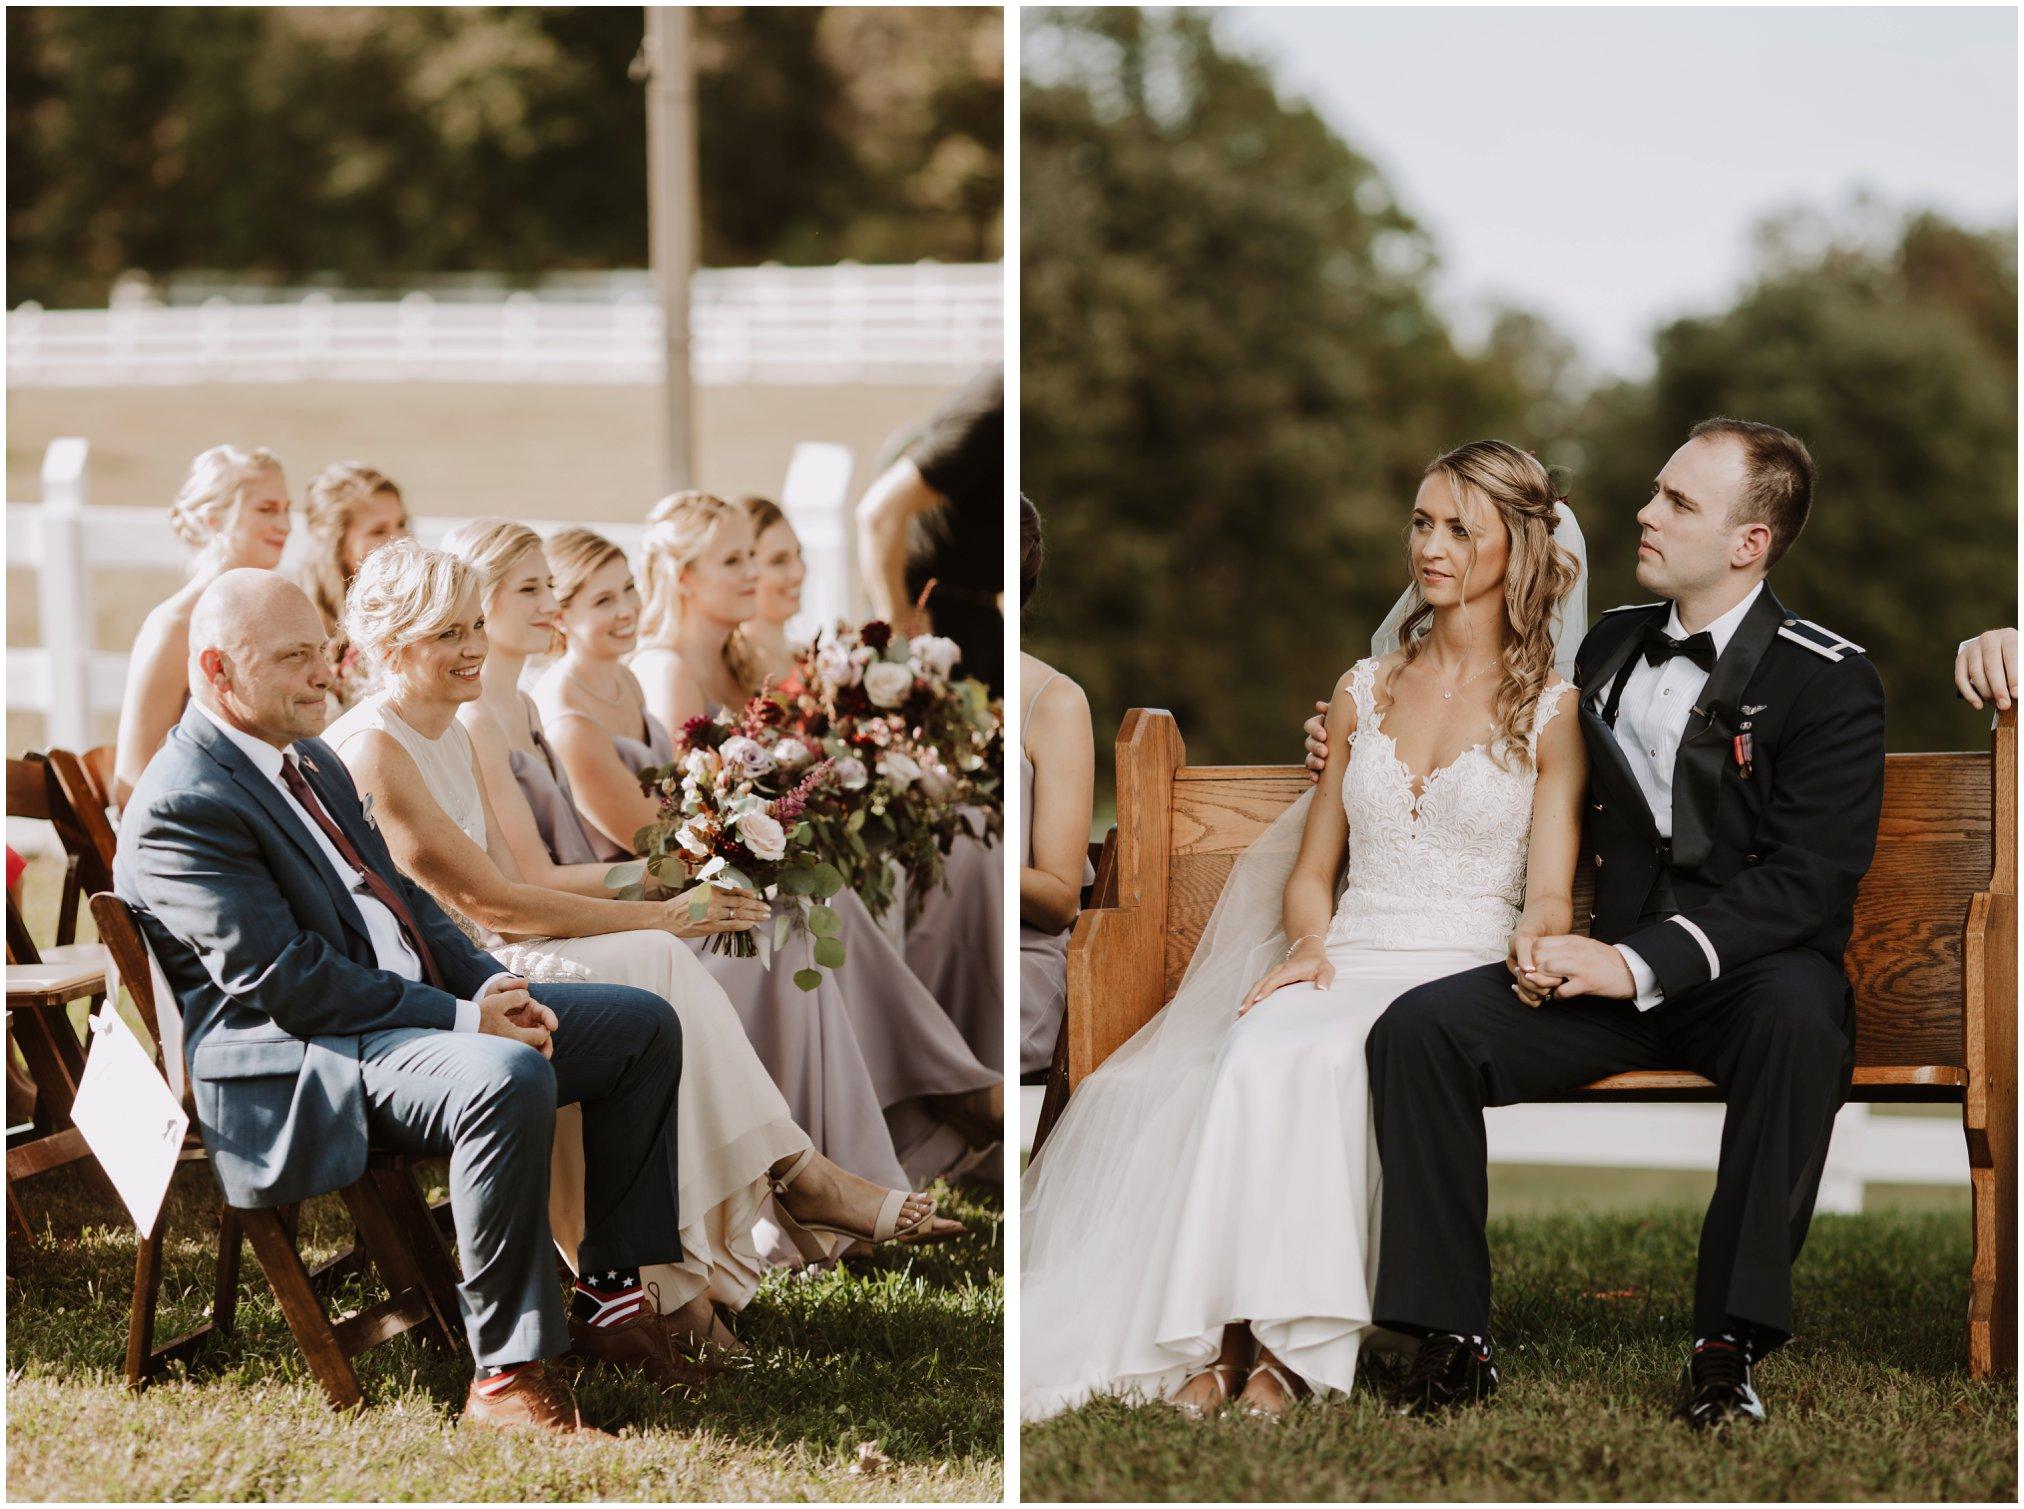 Annapolis Wedding Photographer, Kate Ann Photography, Timberlake Farm, Timberlake Farm Wedding, Annapolis Bride, Earthy Farm Wedding